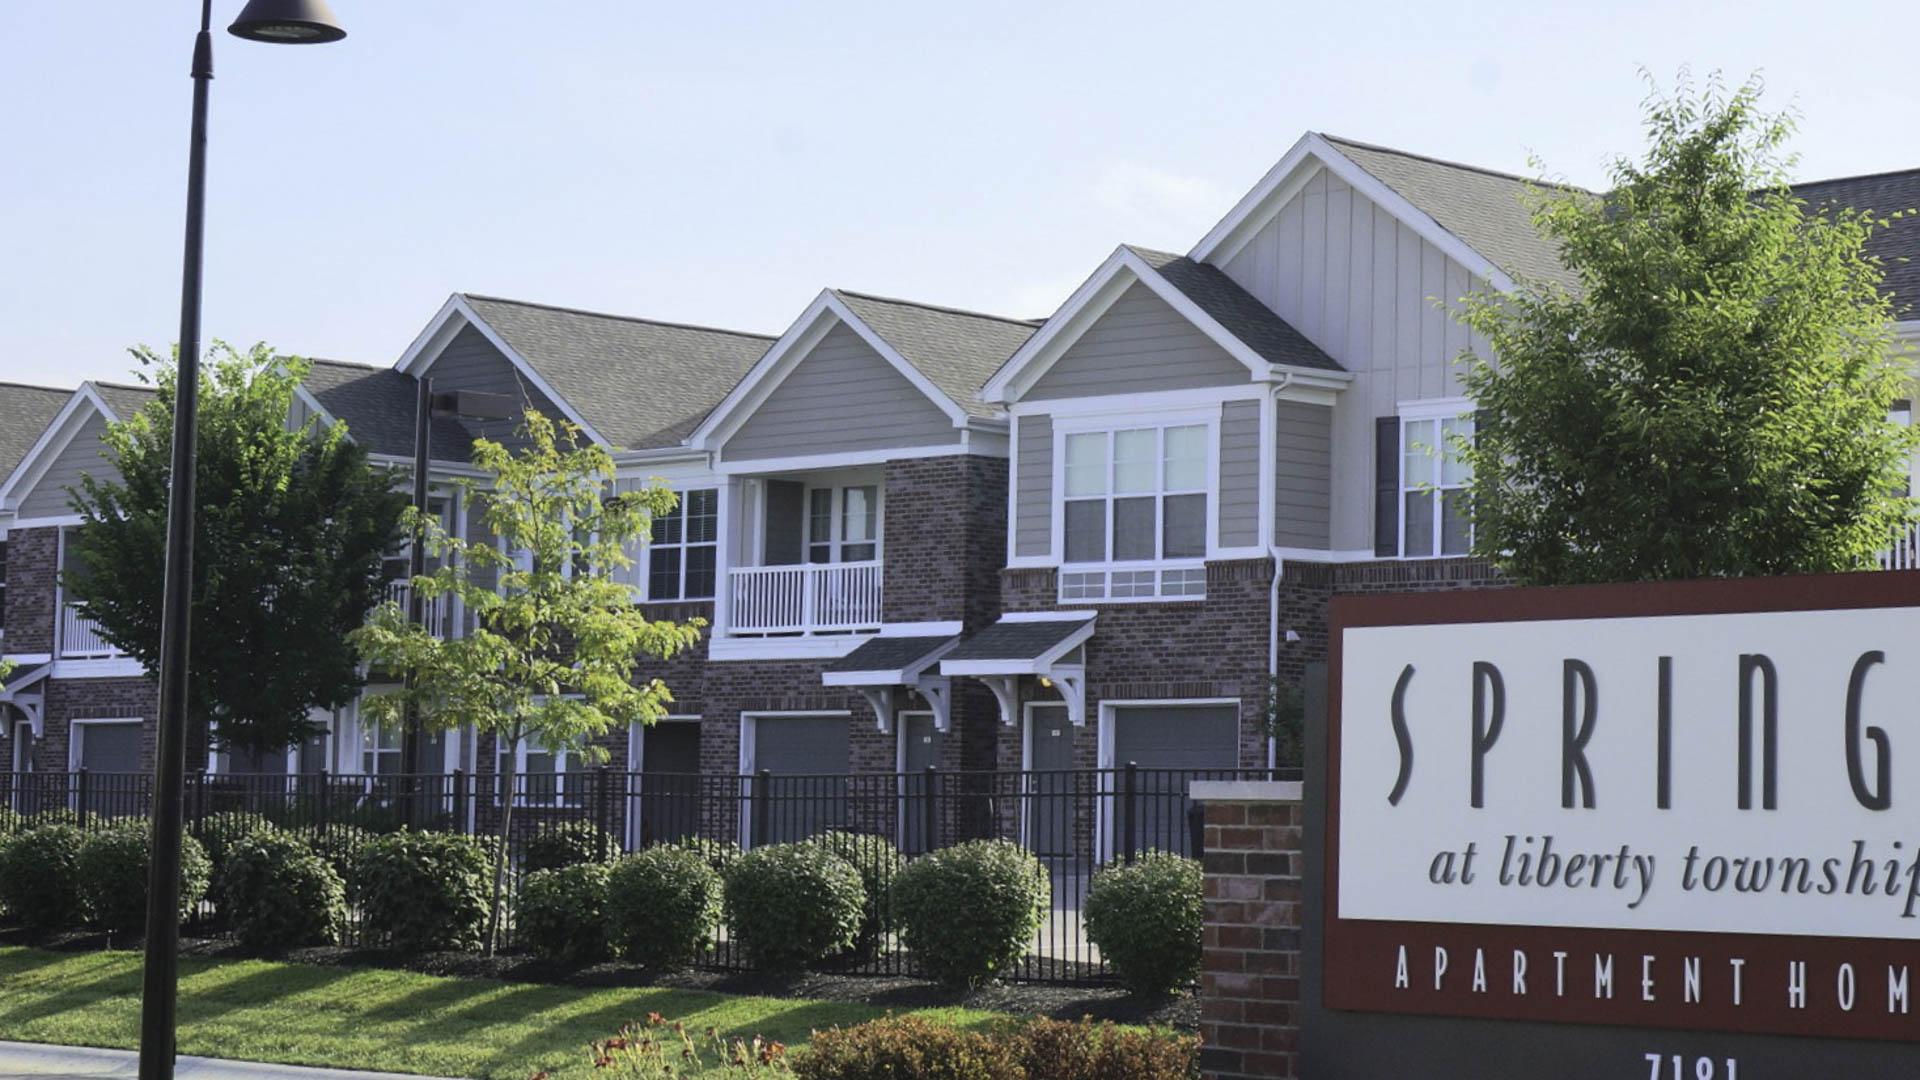 Springs at Liberty Township apartment exterior